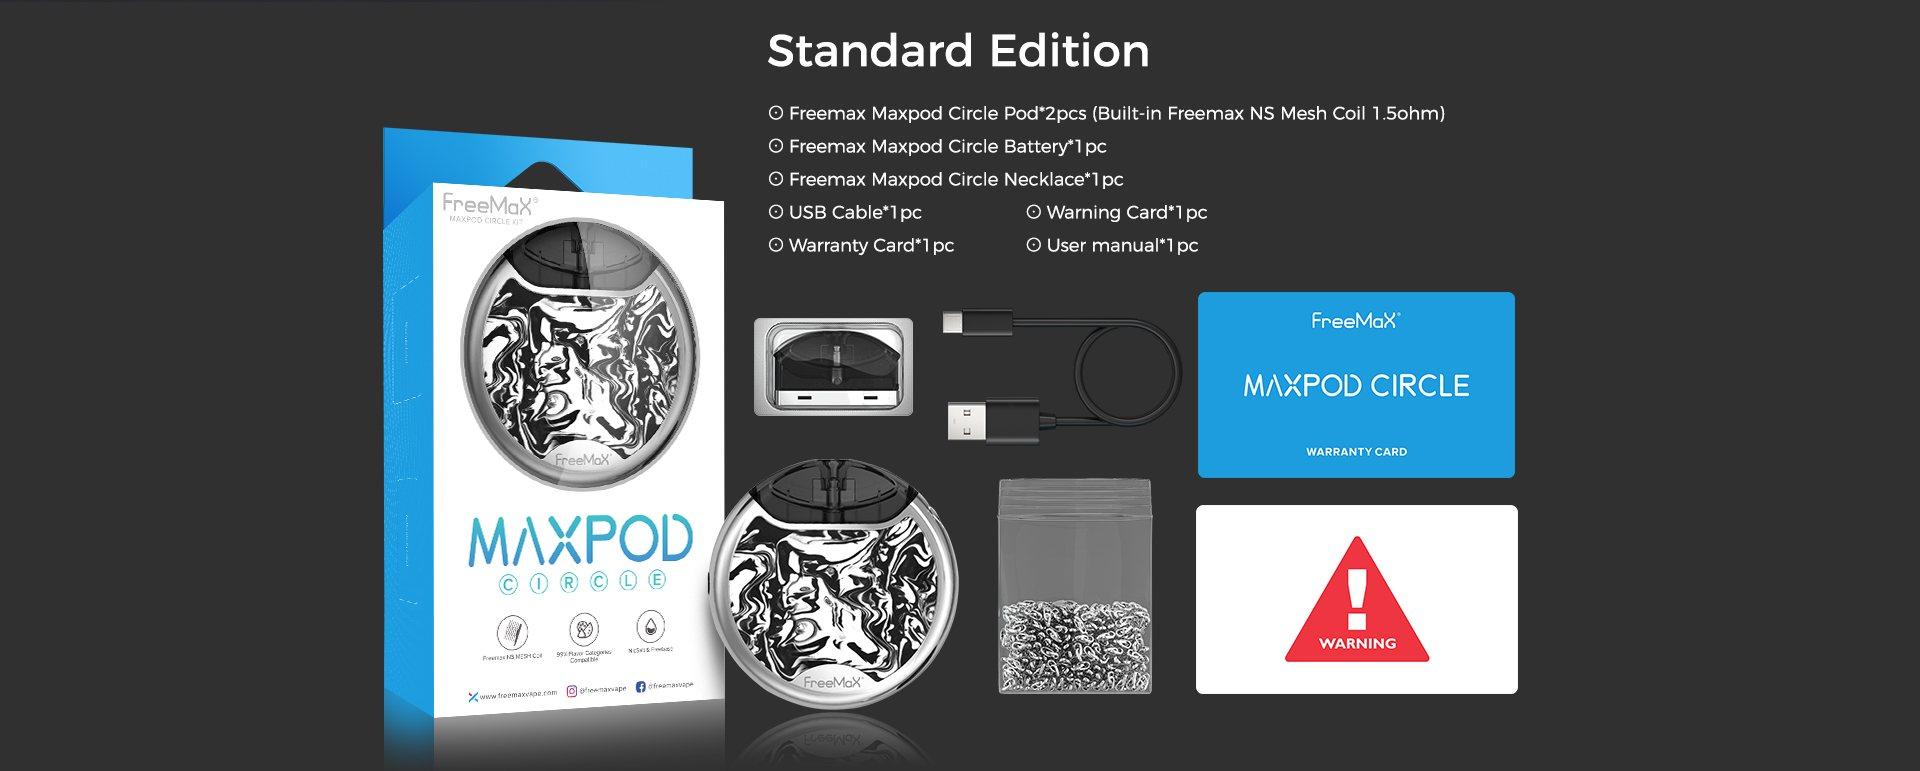 maxpod-circle-kit-Standard-Edition